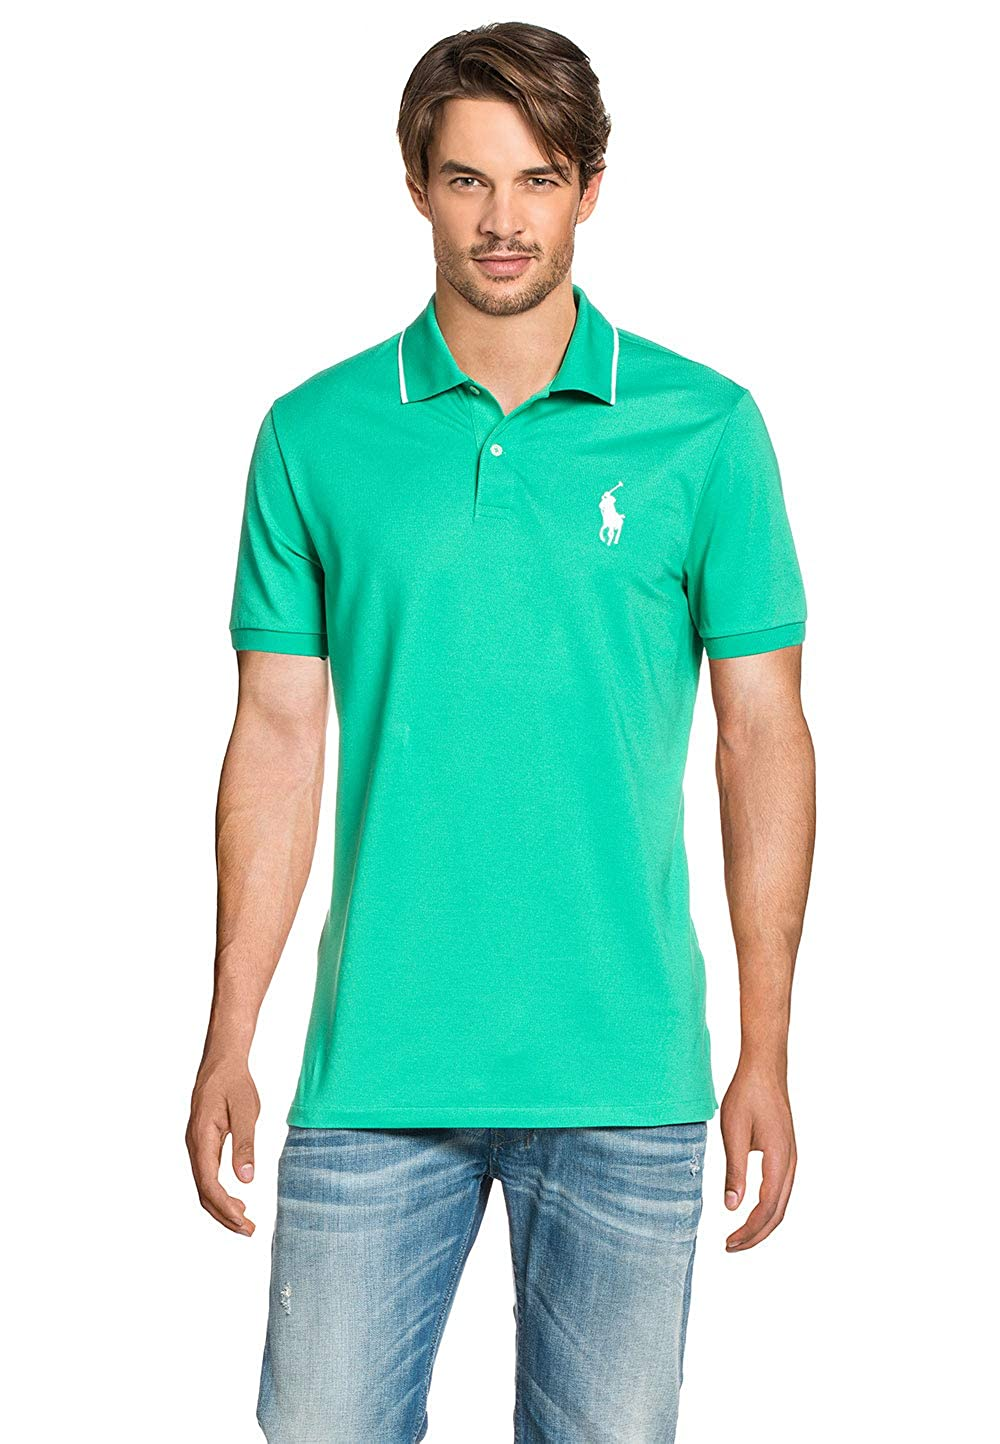 Polo Ralph Lauren Mens Polo Shirt Turquoise, tamaño:S: Amazon.es ...